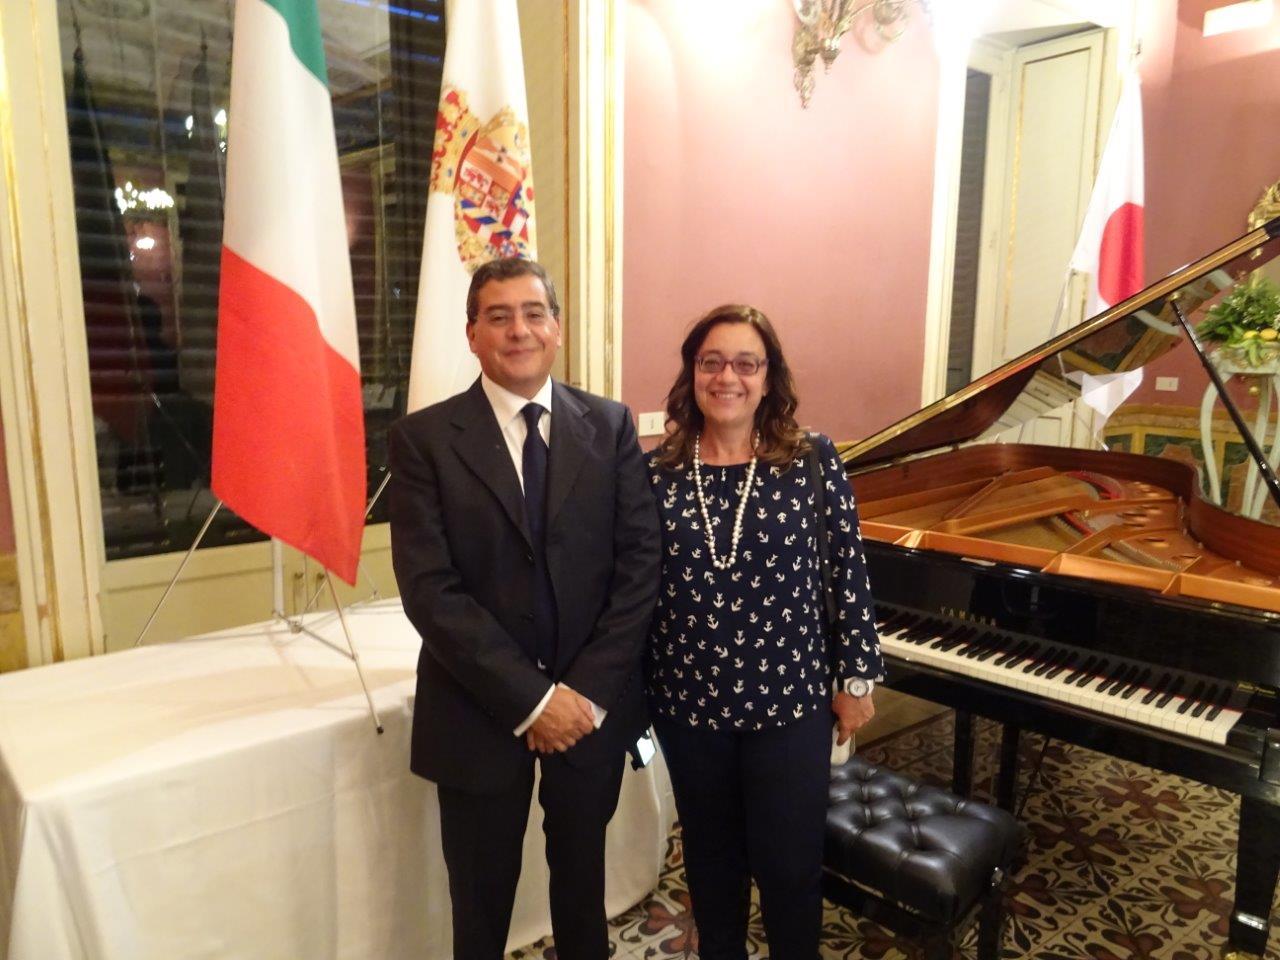 Gala Pantelleria pianista (5)